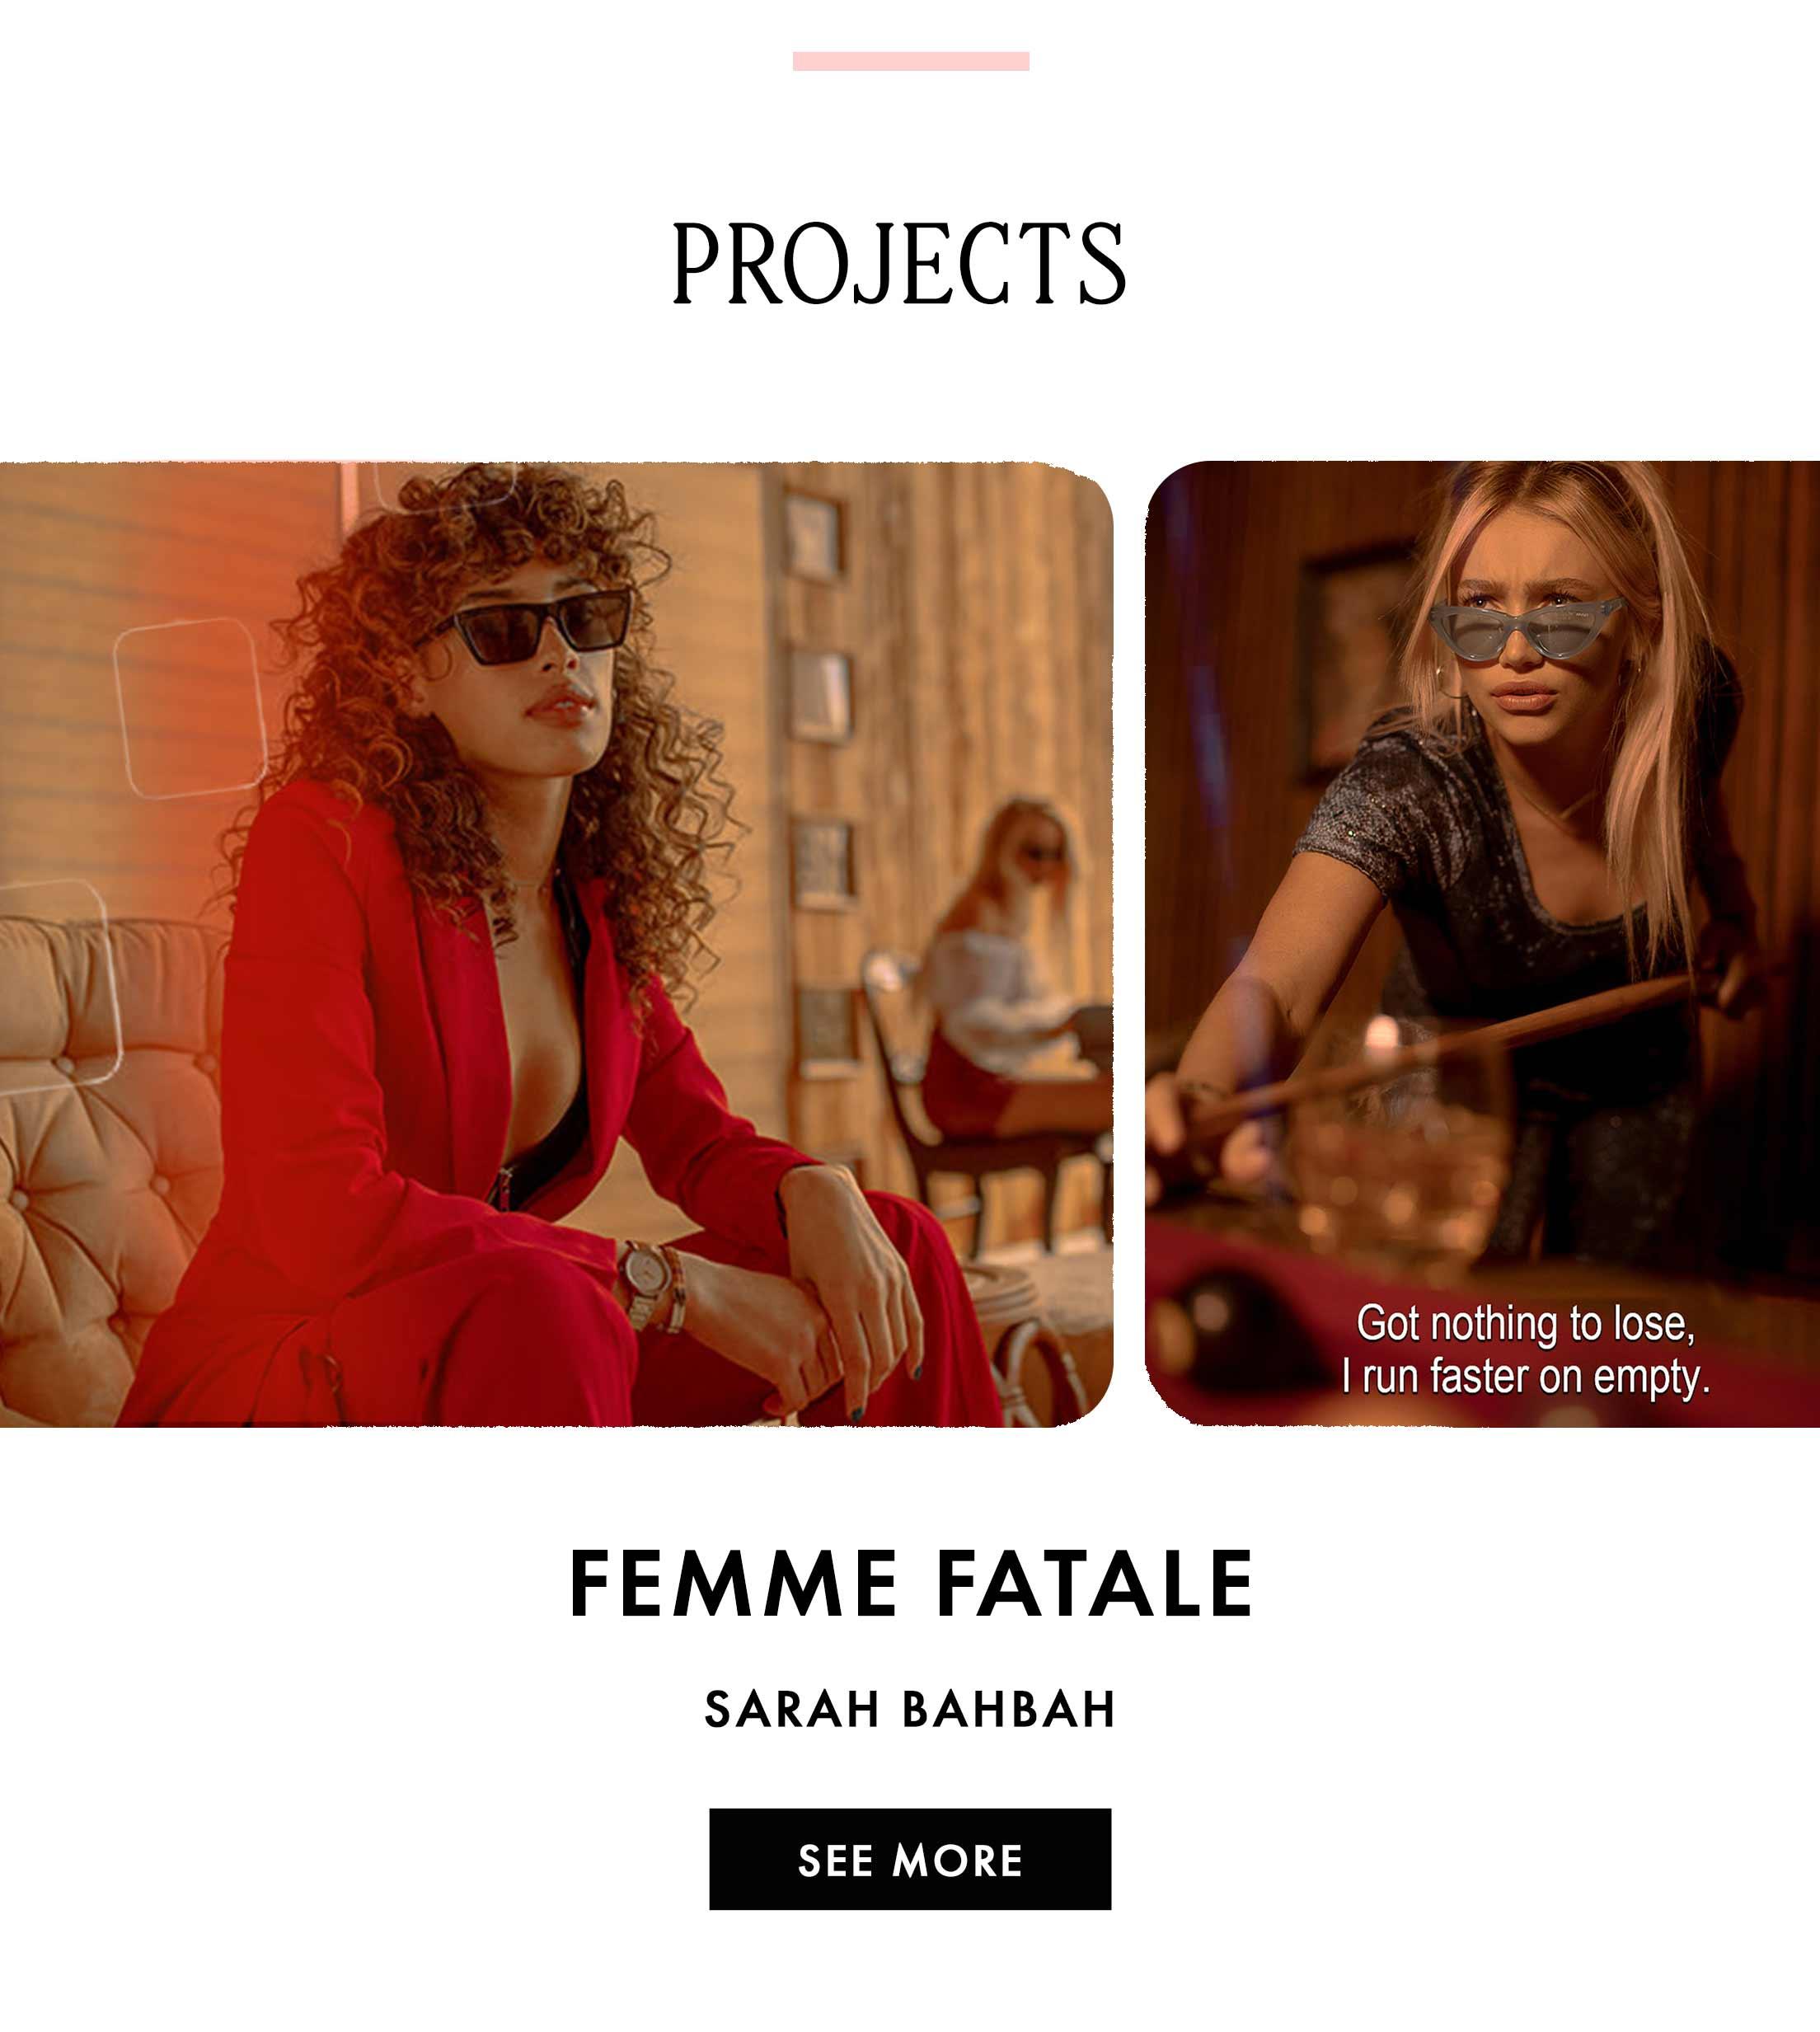 Femme Fatale: Sarah Bahbah